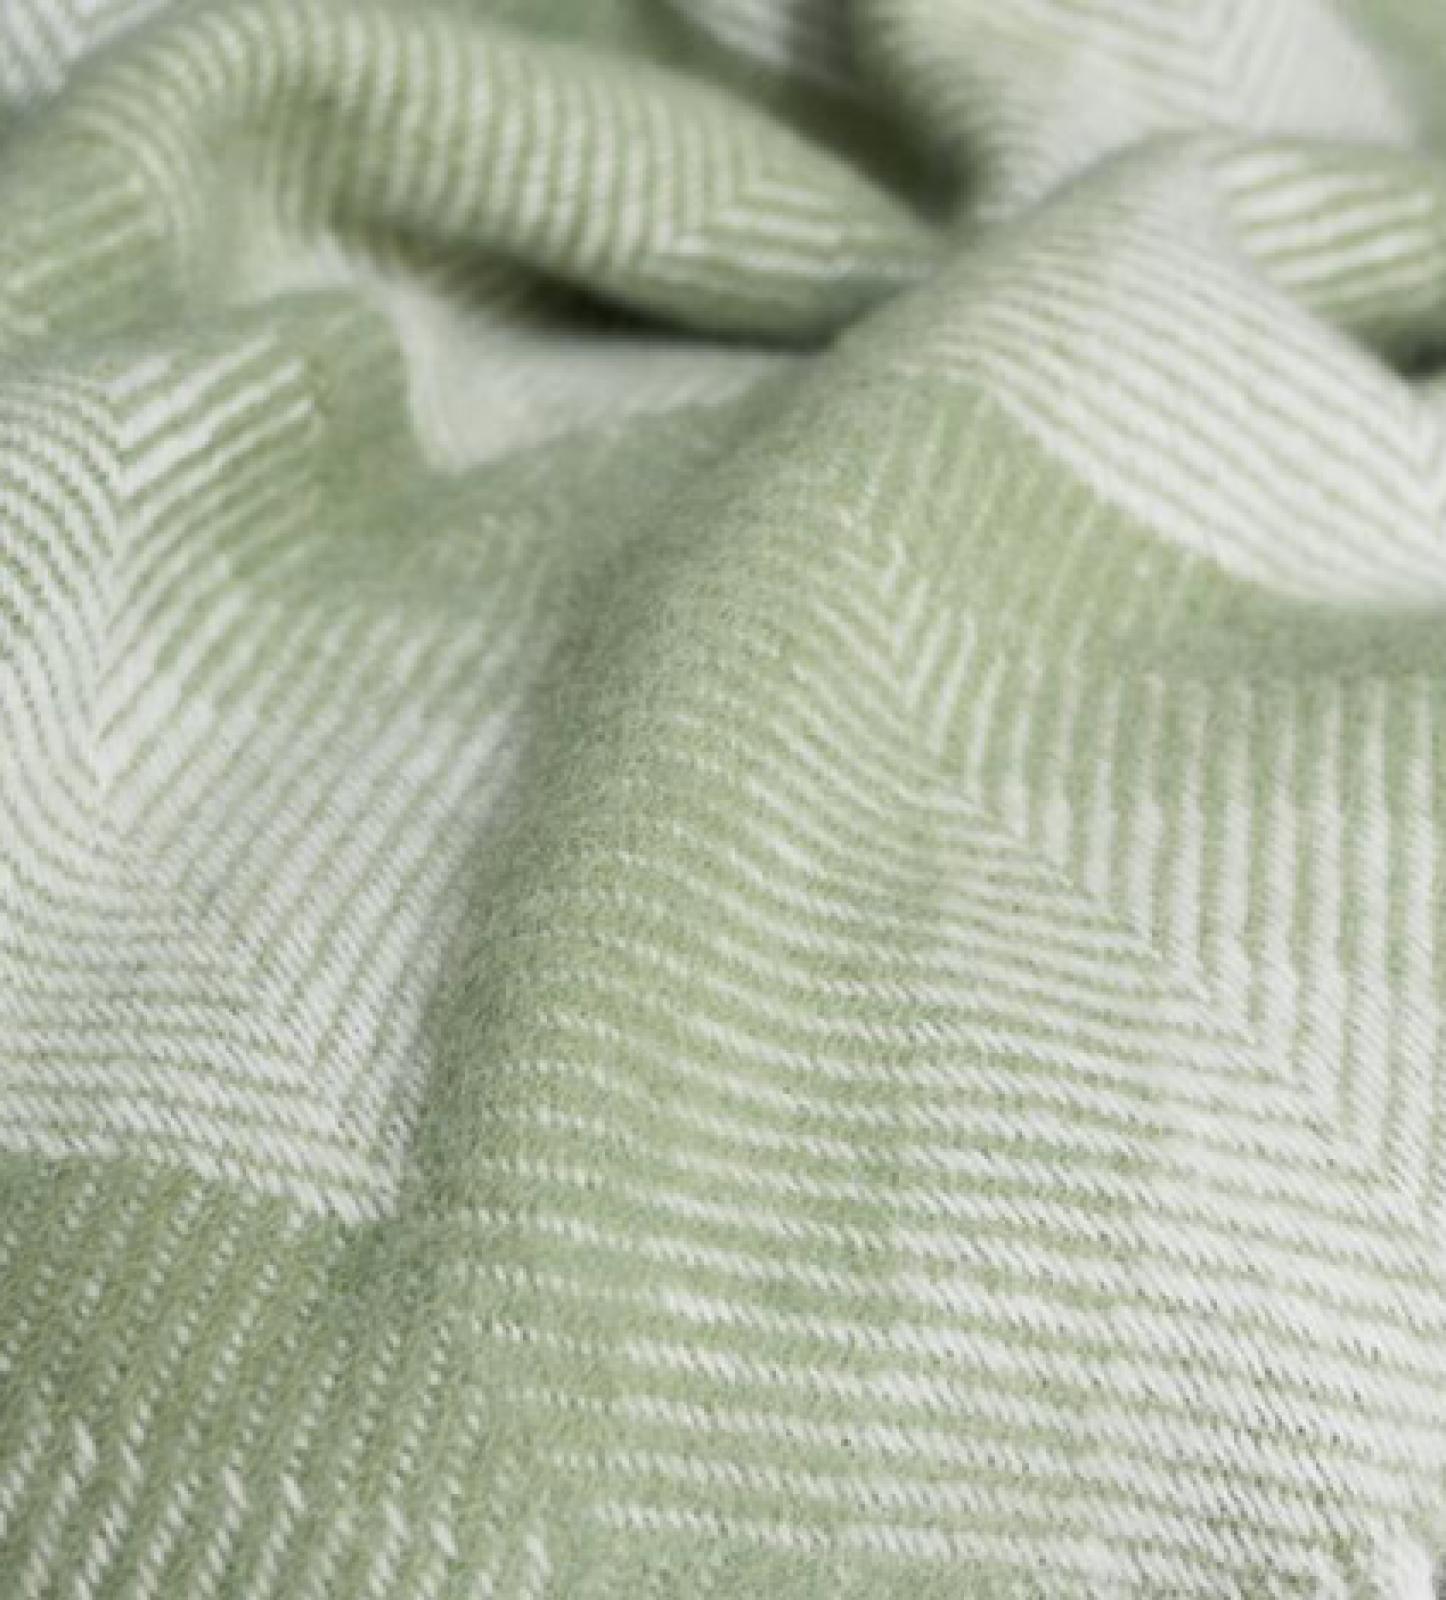 Prism Wool Blanket Fern 150x183cm thumbnails